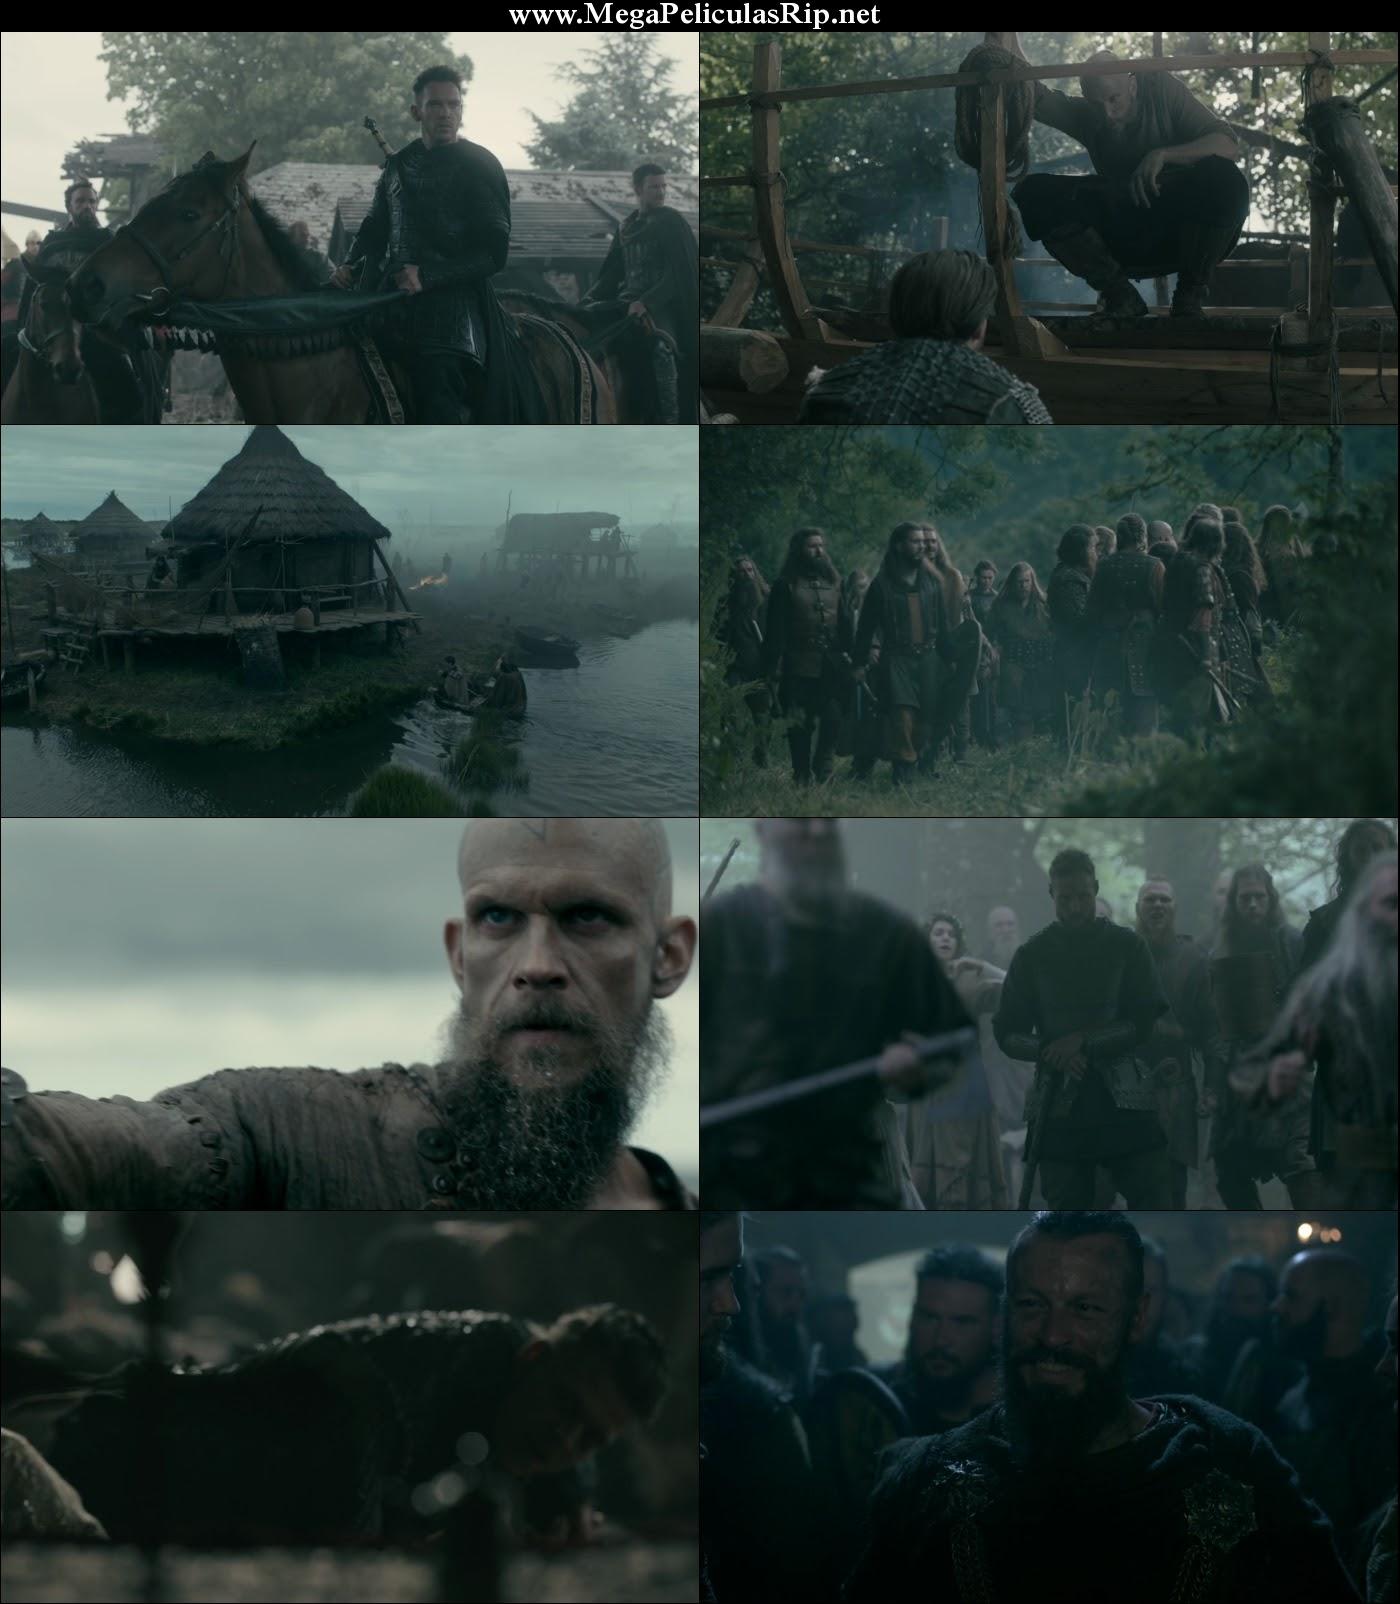 Vikingos Temporada 5 1080p Latino Ingles Mega Megapeliculasrip Megapeliculasrip